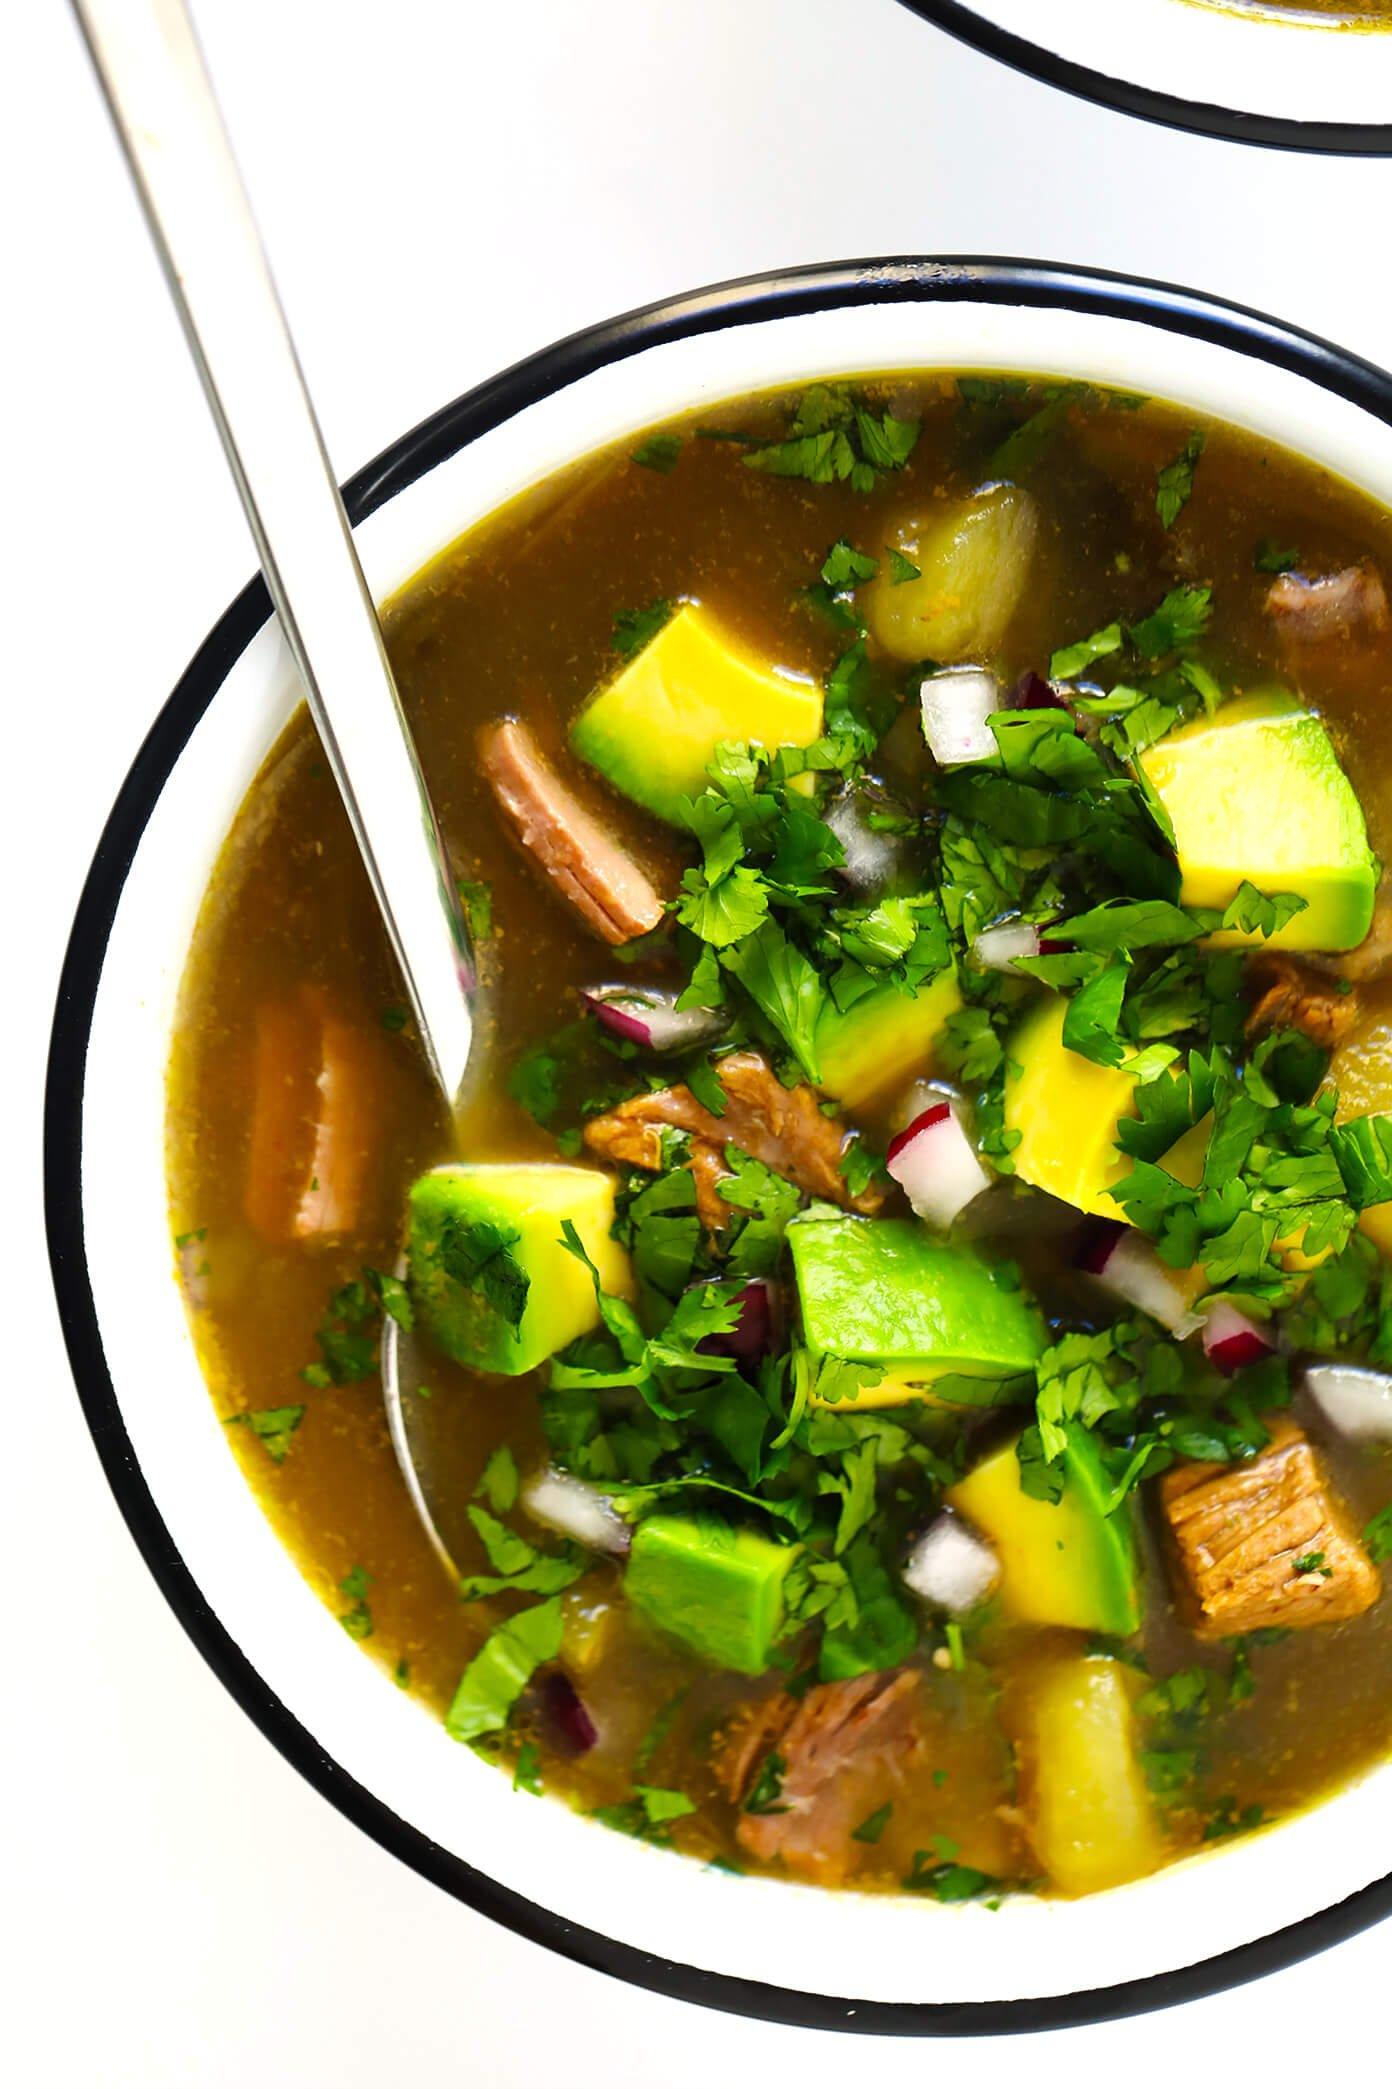 Salsa Verde Steak Soup with Avocado and Cilantro